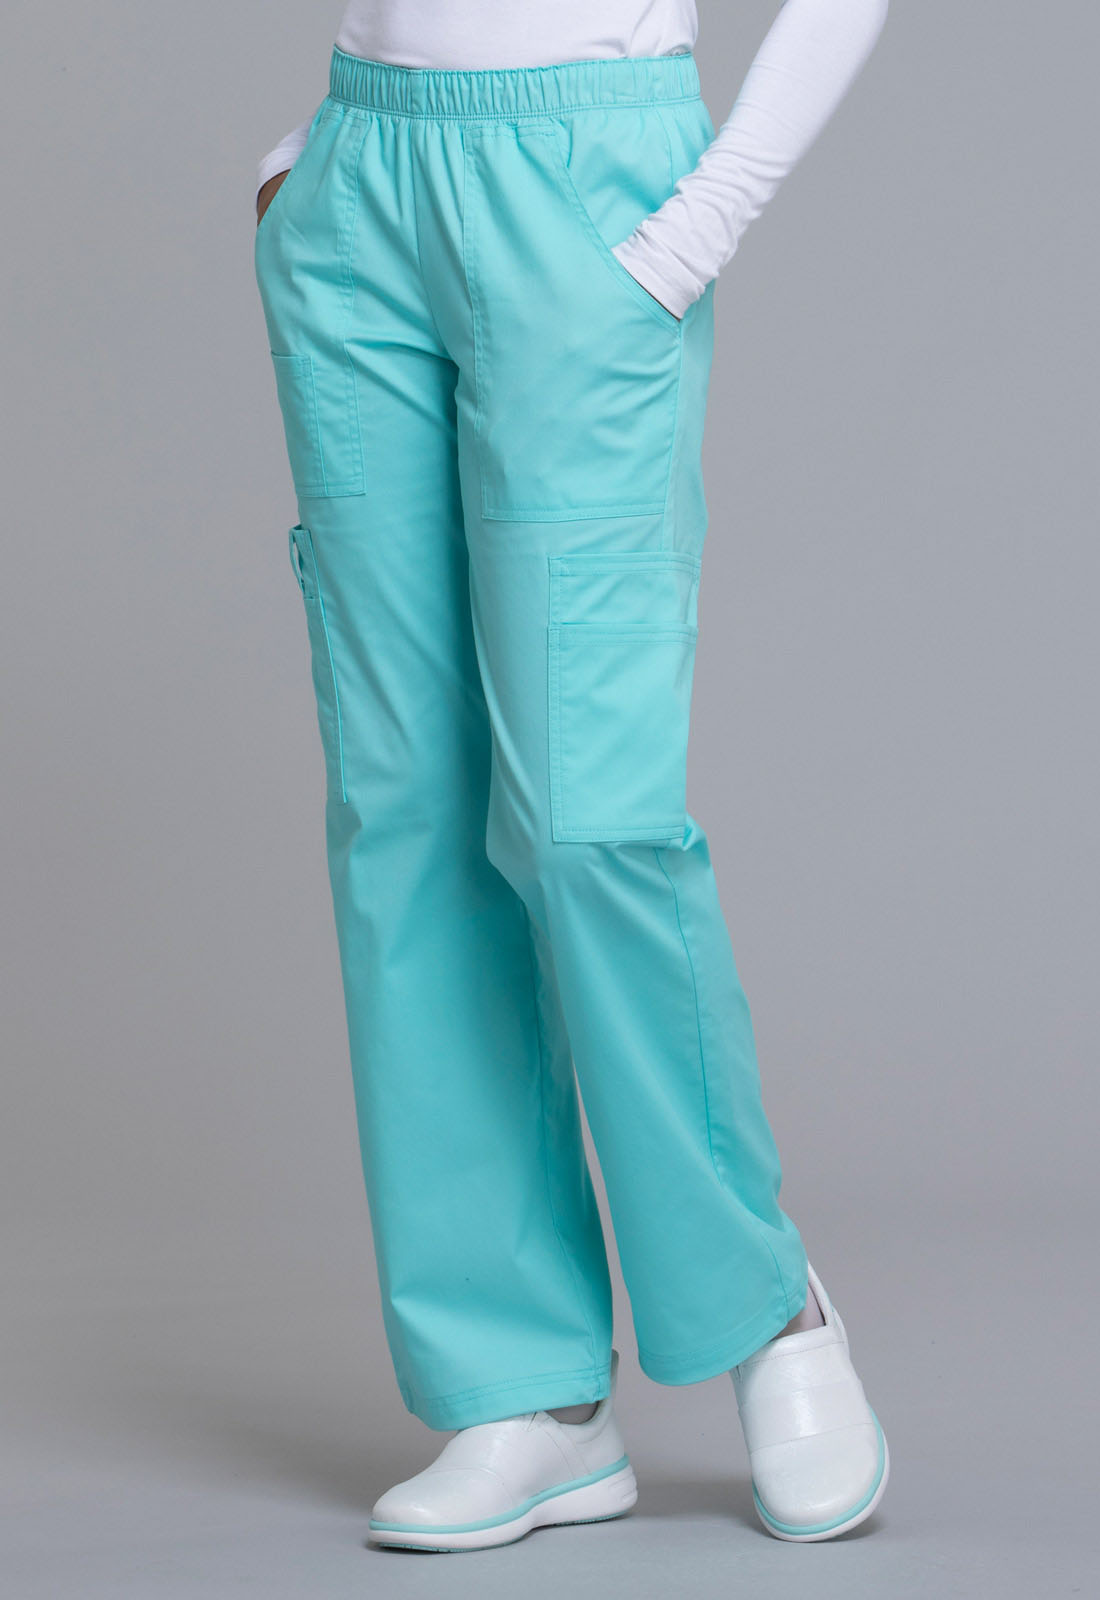 560b34b69e4 Cherokee Workwear. WW Core Stretch Mid Rise Pull-On Pant Cargo Pant in  Tahiti Sweetie (Petite)